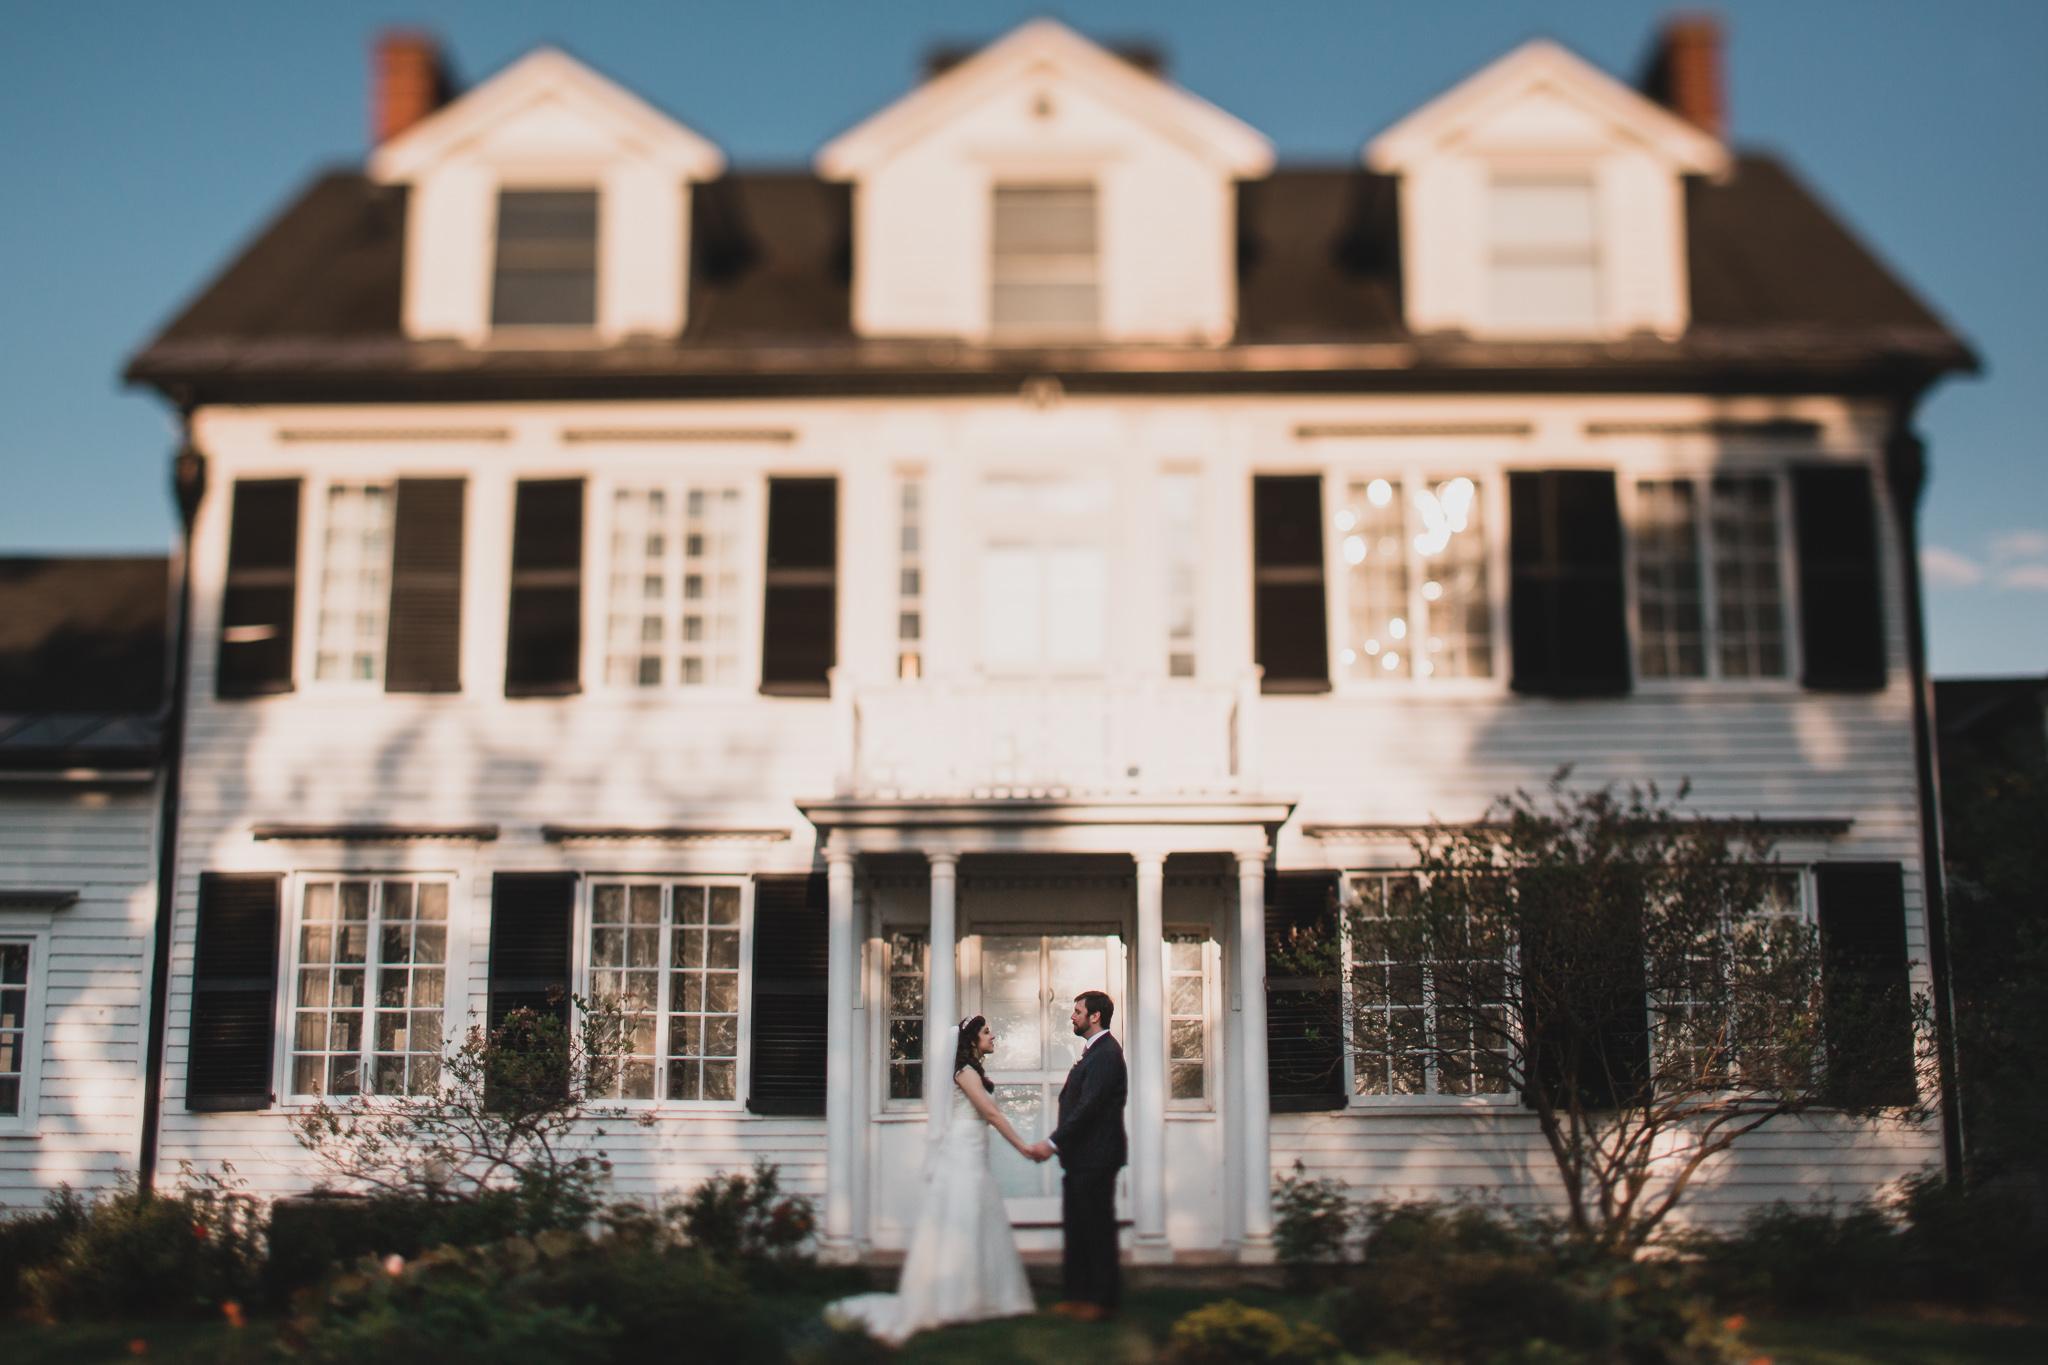 Ottawa outdoor wedding venues, Museum, Billings estate